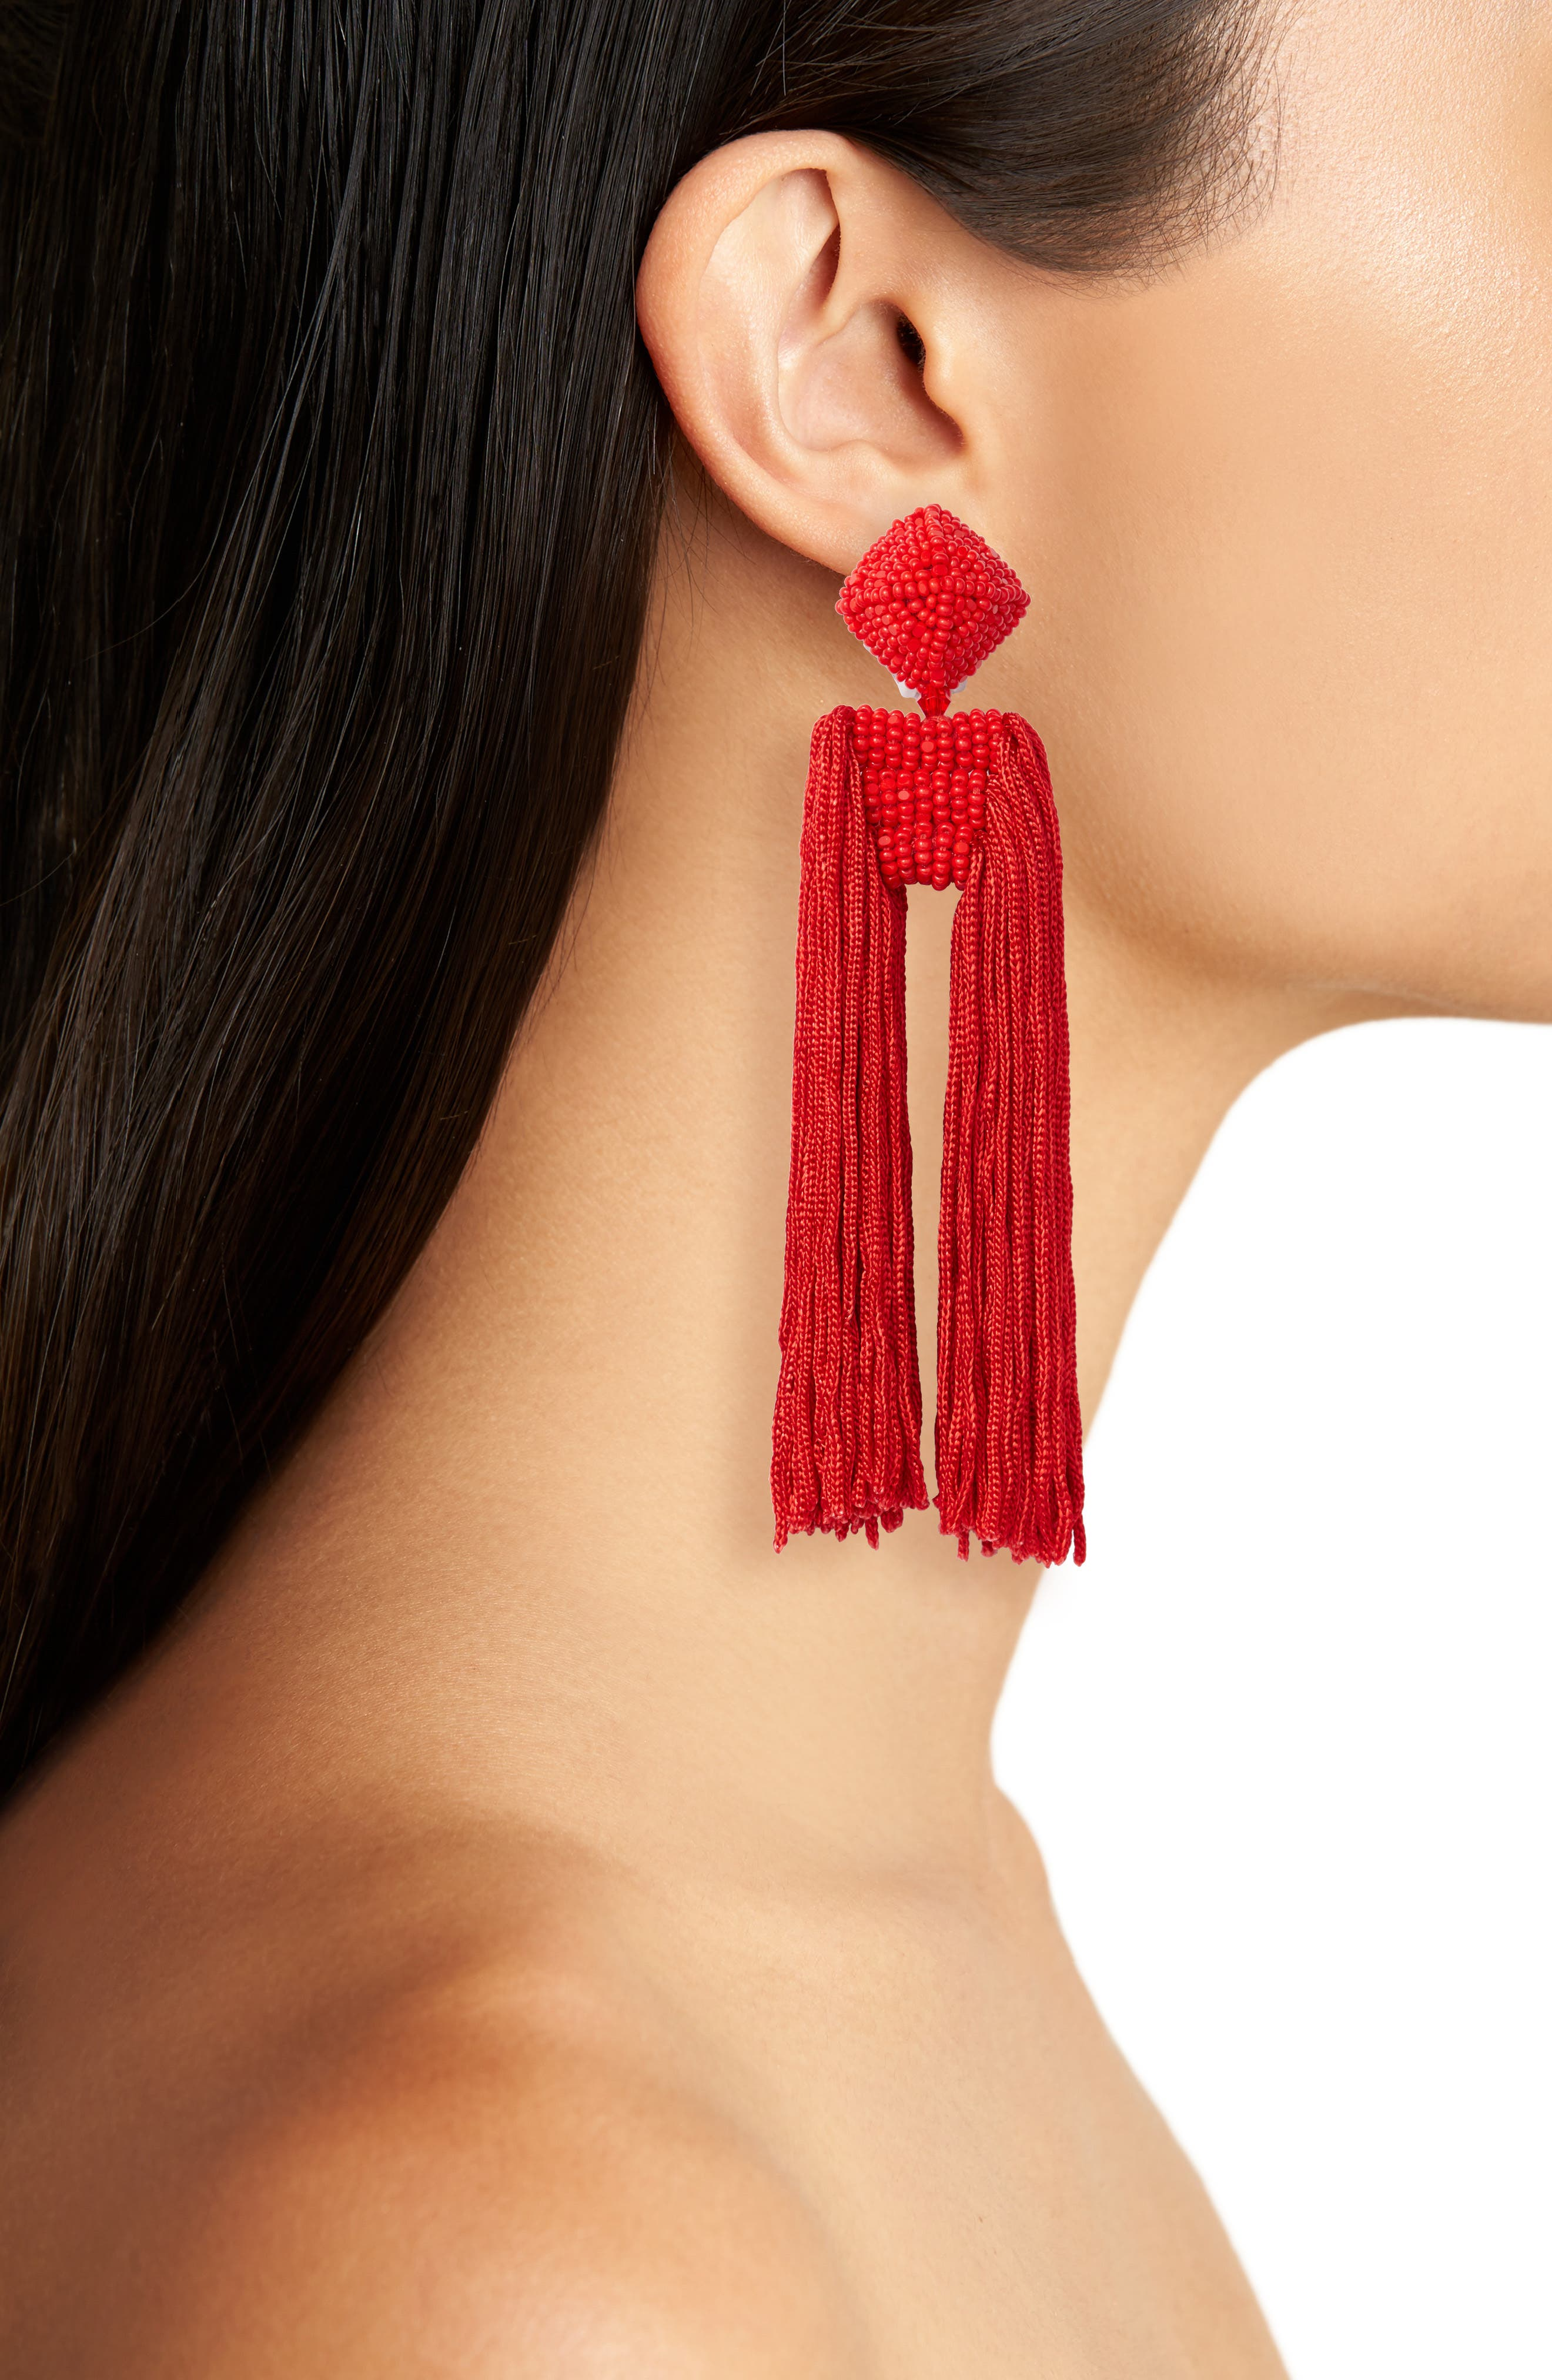 Dupio Tassel Drop Earrings,                             Alternate thumbnail 2, color,                             Goji Berry